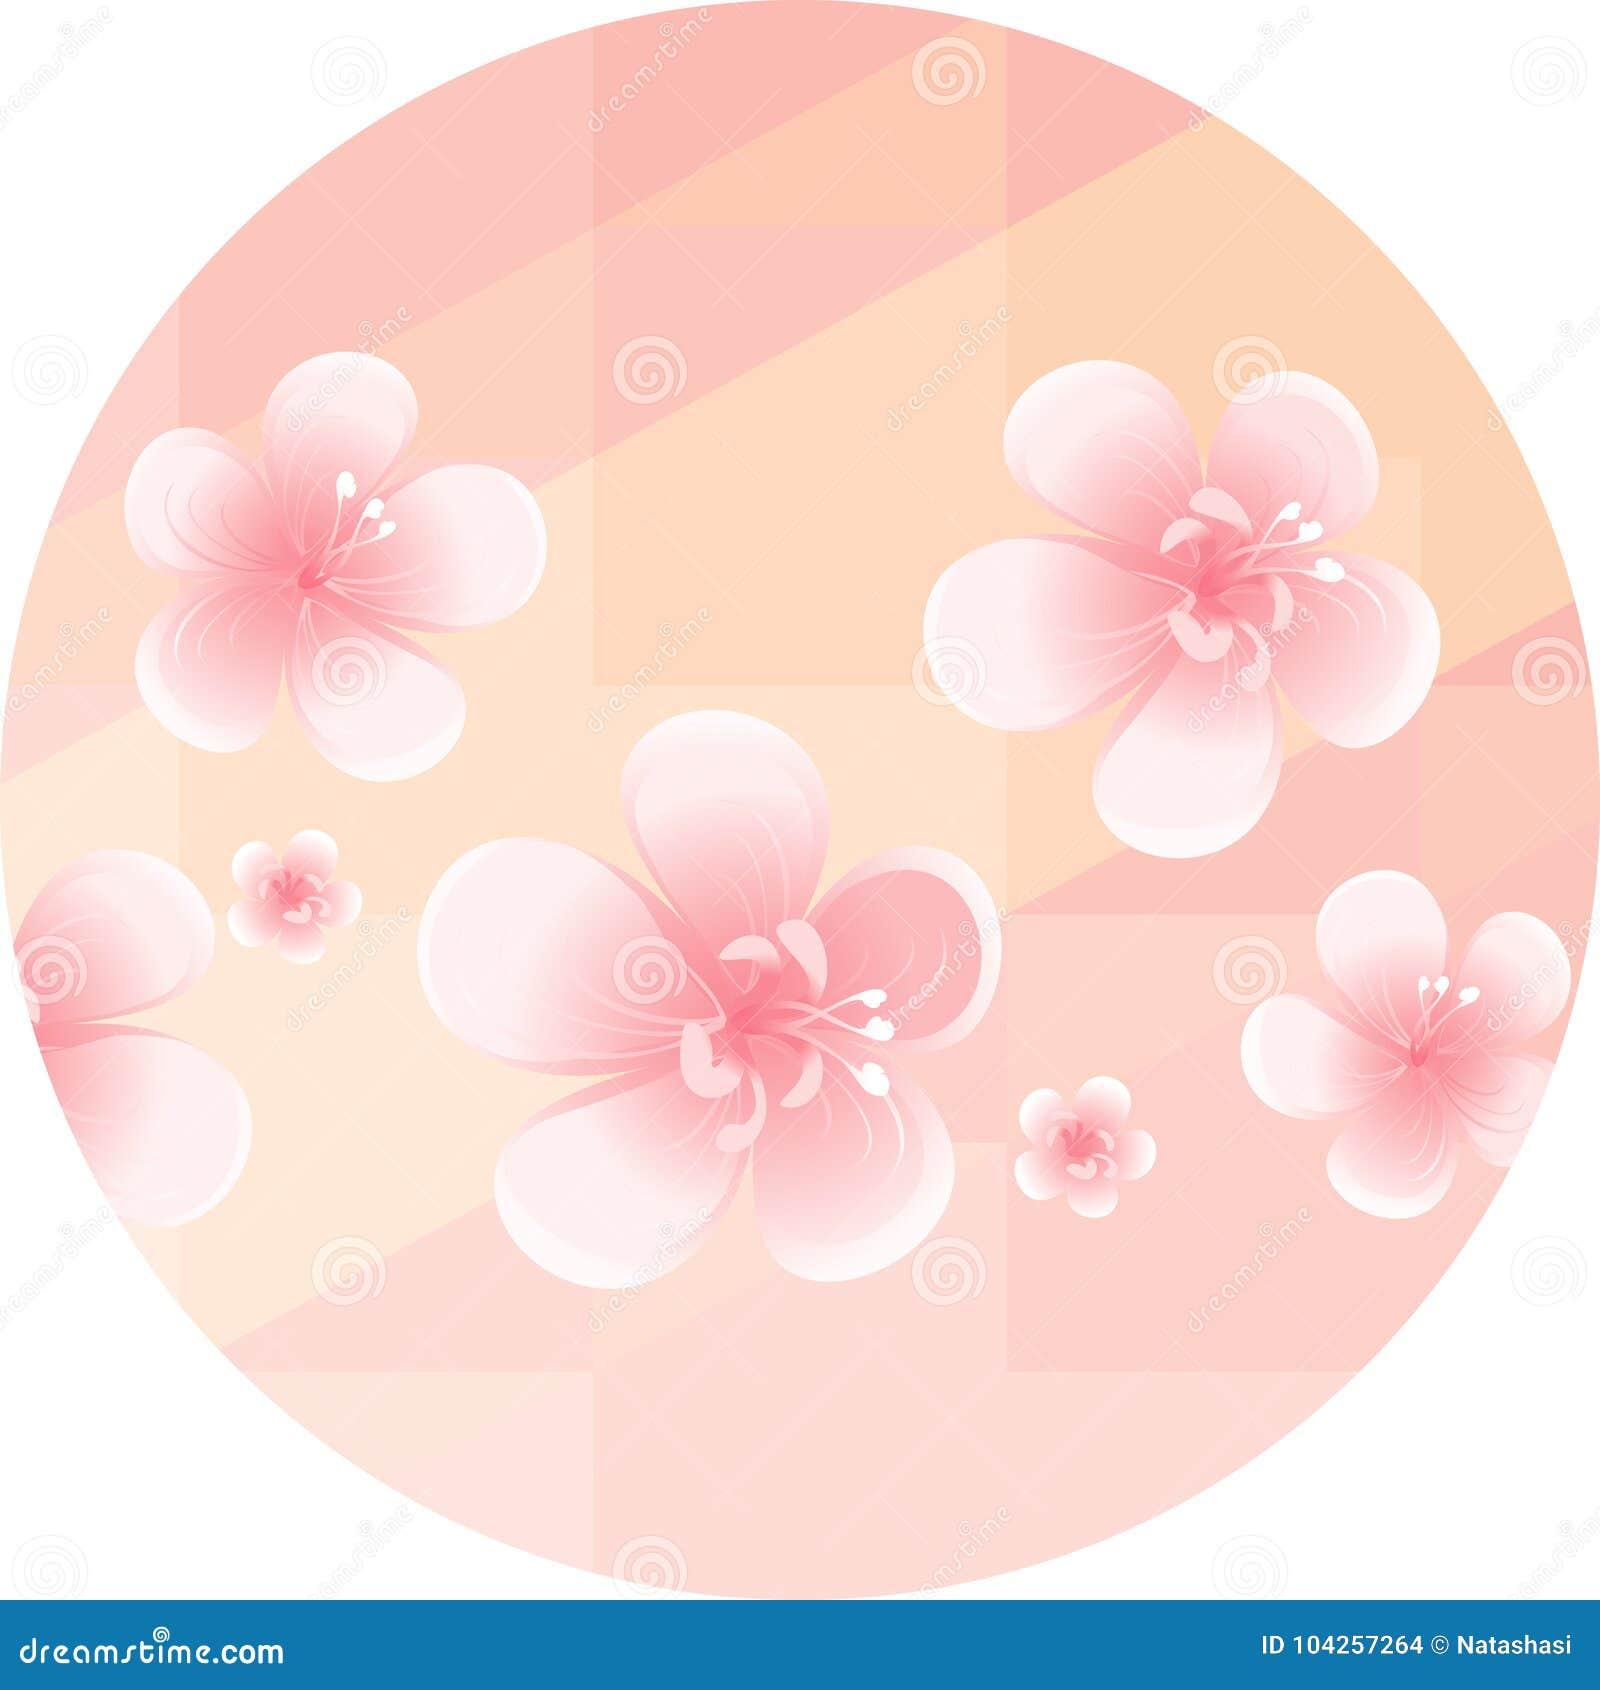 Pink Orange Flowers Isolated On Soft Light Orange Polygonal